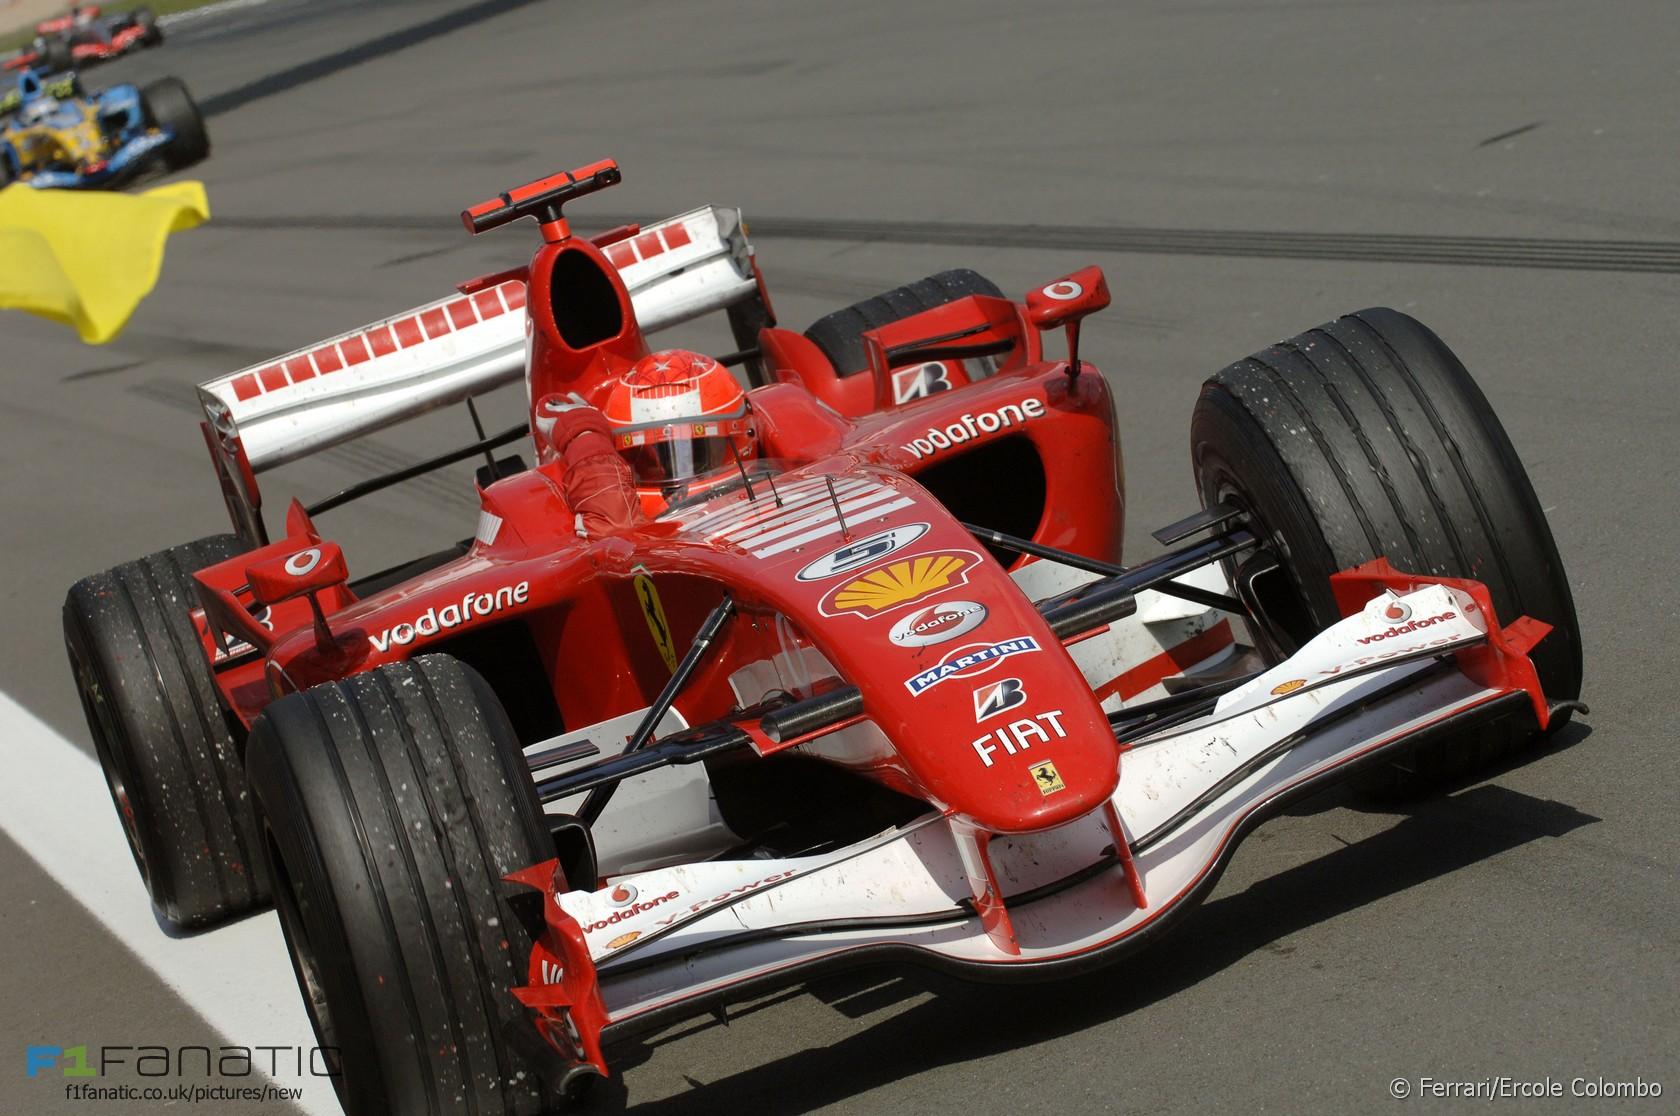 Michael Schumacher, Ferrari, Nurburgring, 2015